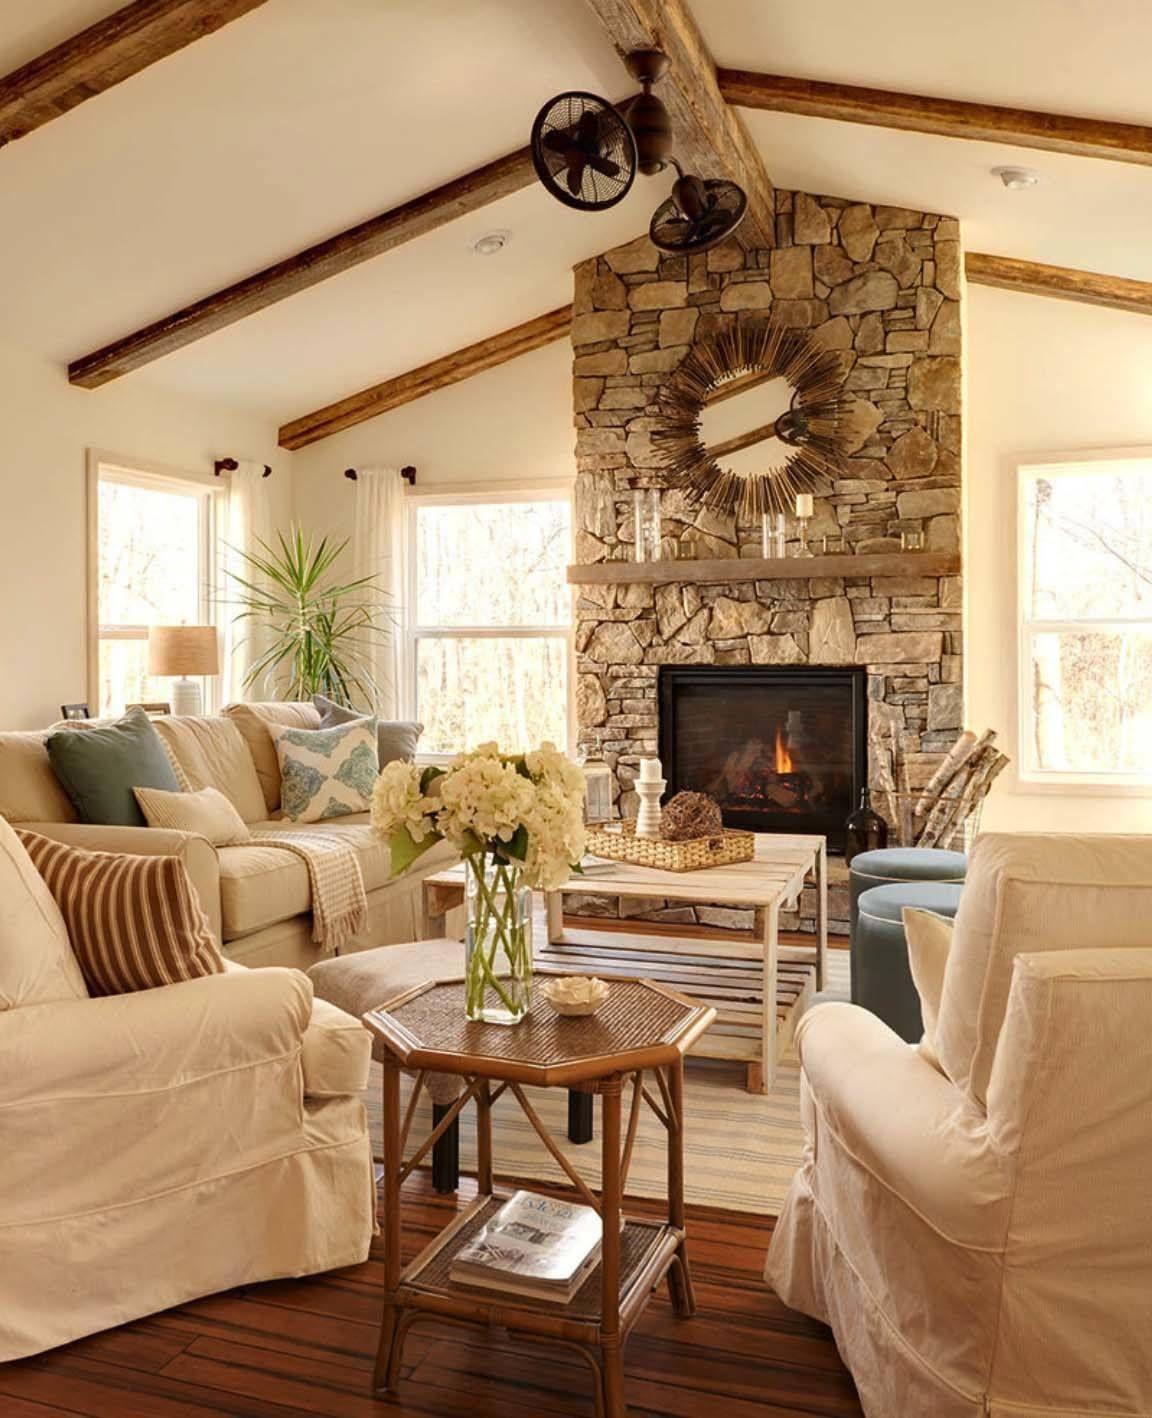 44 Ultra cozy fireplaces for winter hibernation | Living ...